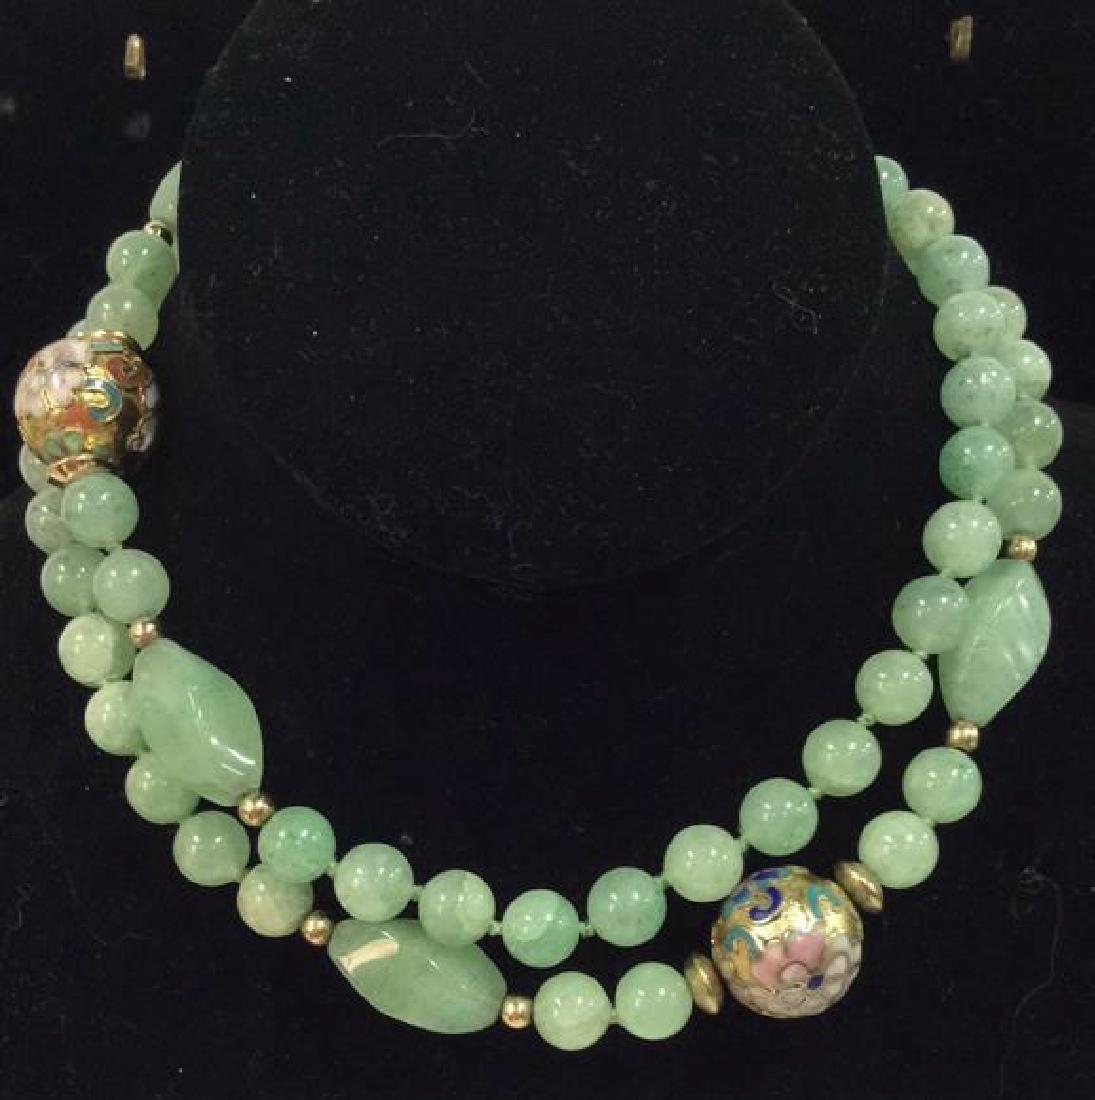 Poss Jadeite Beaded Necklace W Cloisonné Beads